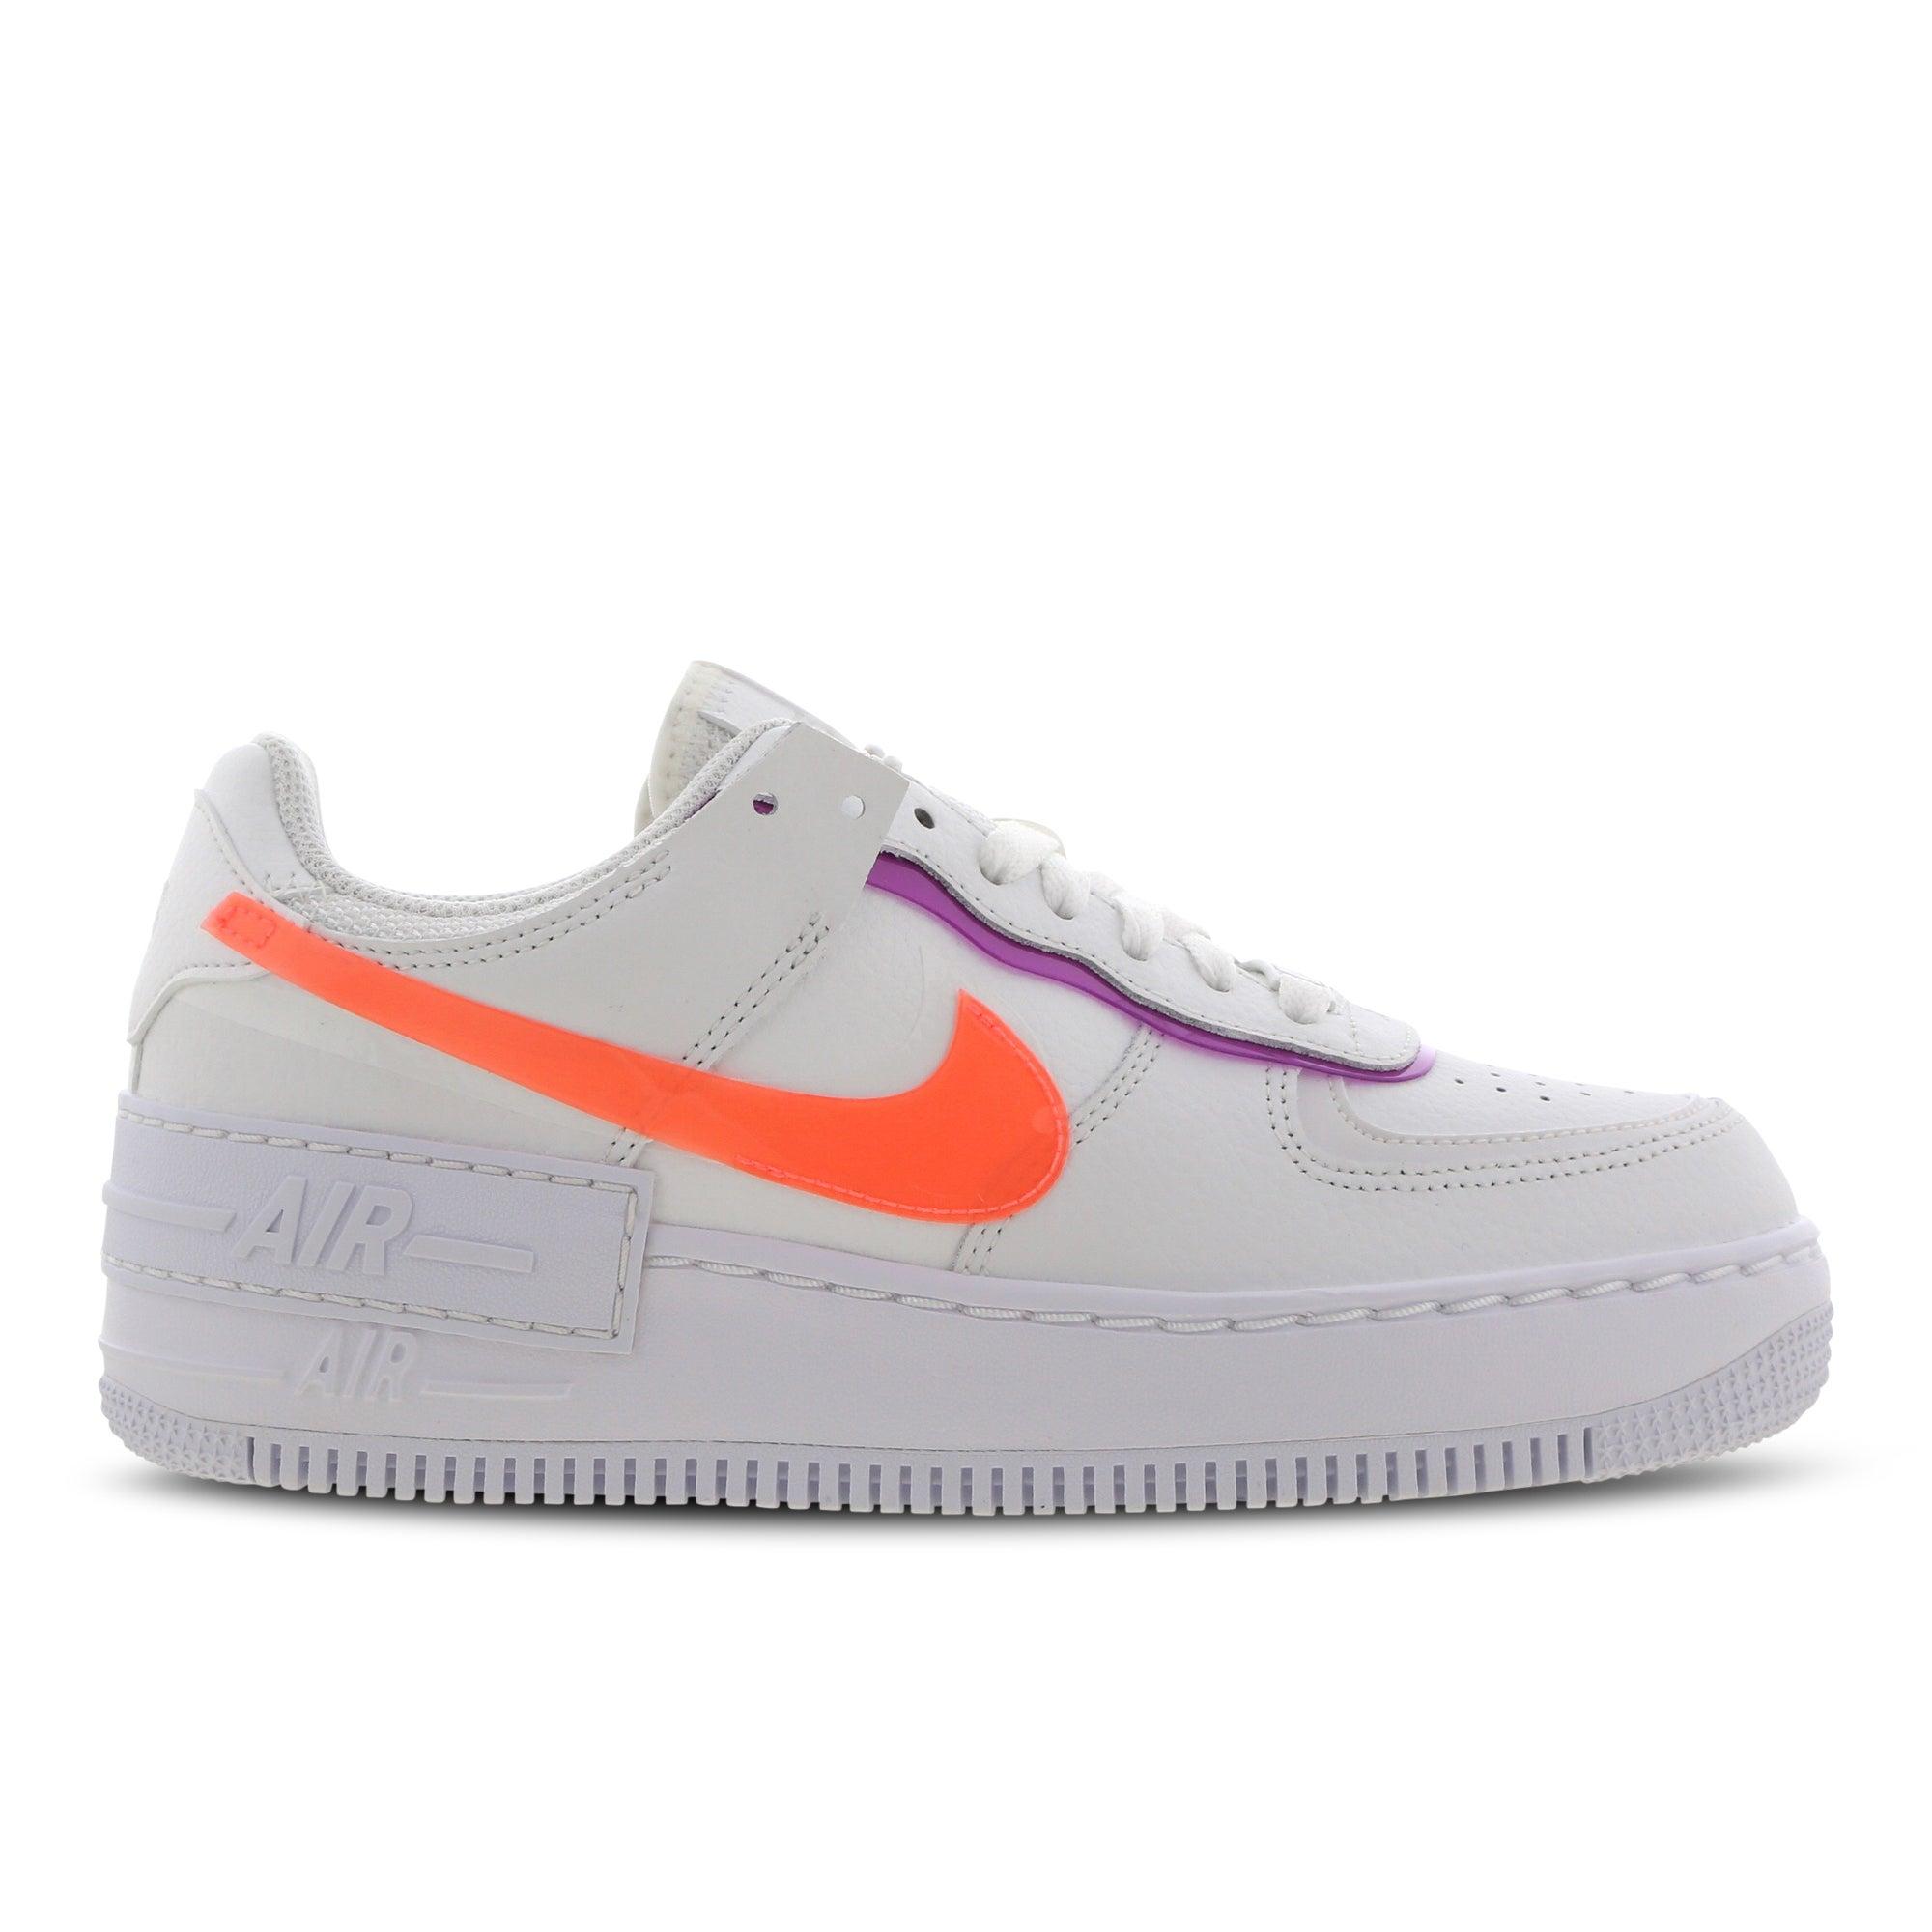 Nike Air Force 1 Shadow - Women Shoes